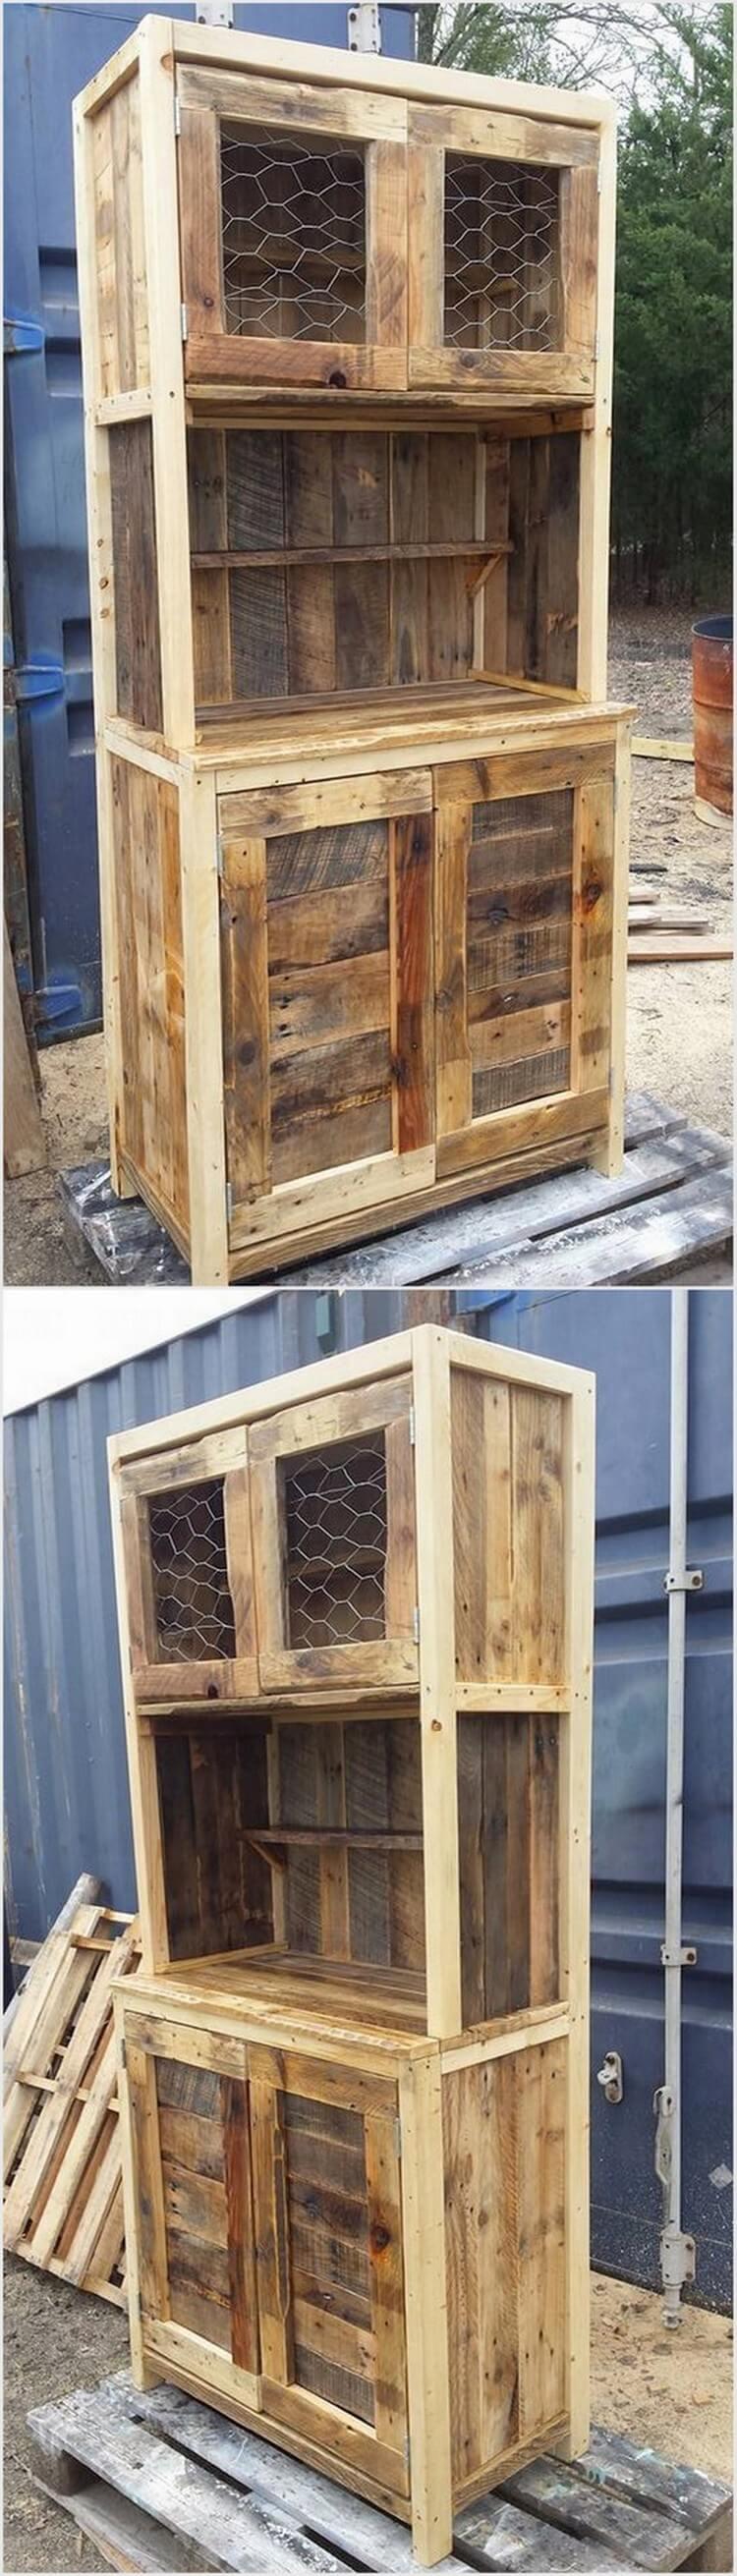 Rustic Pallet Storage Cabinet